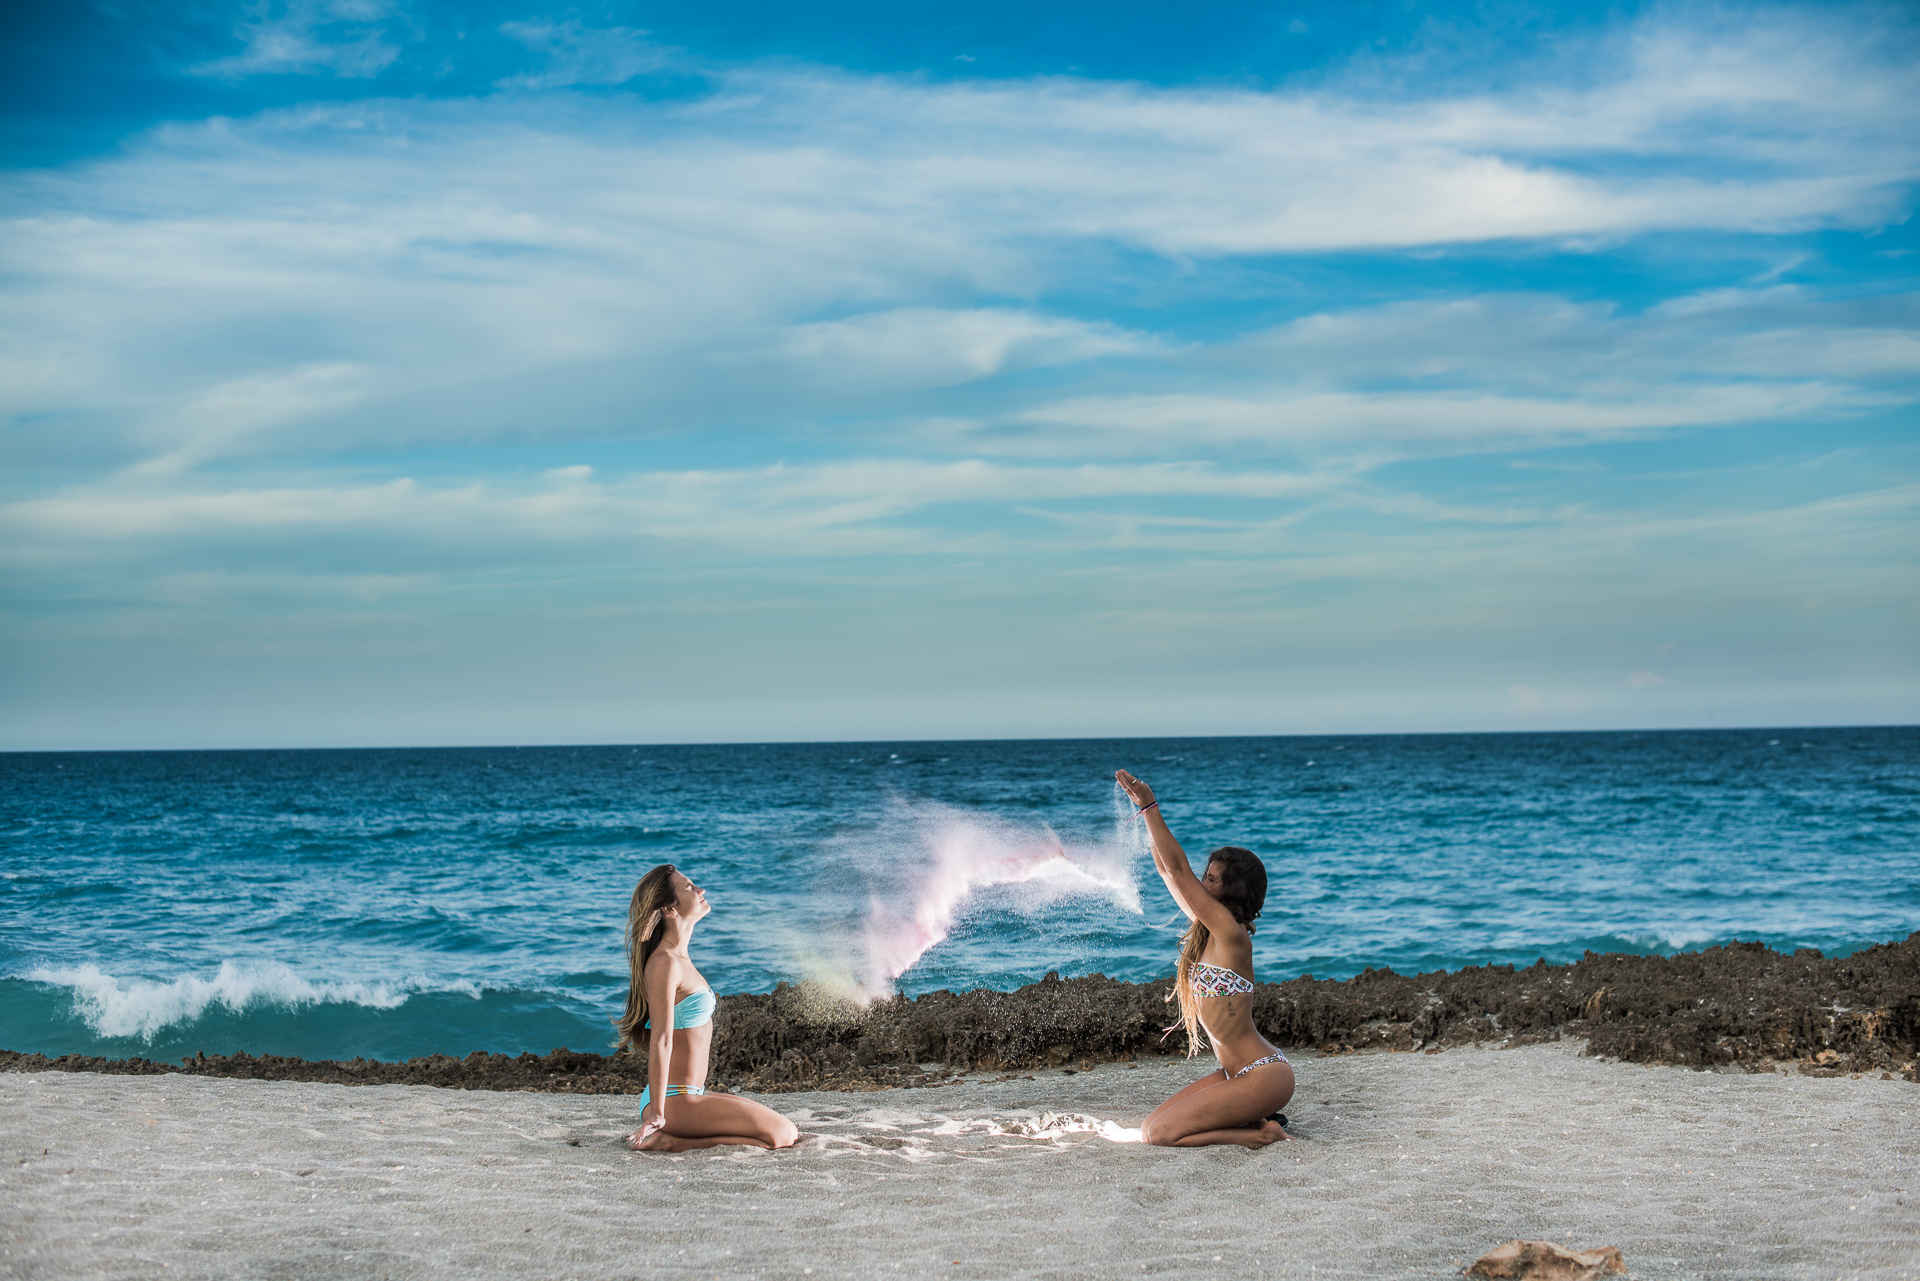 bahamasgirlblowingrocks-305.jpg